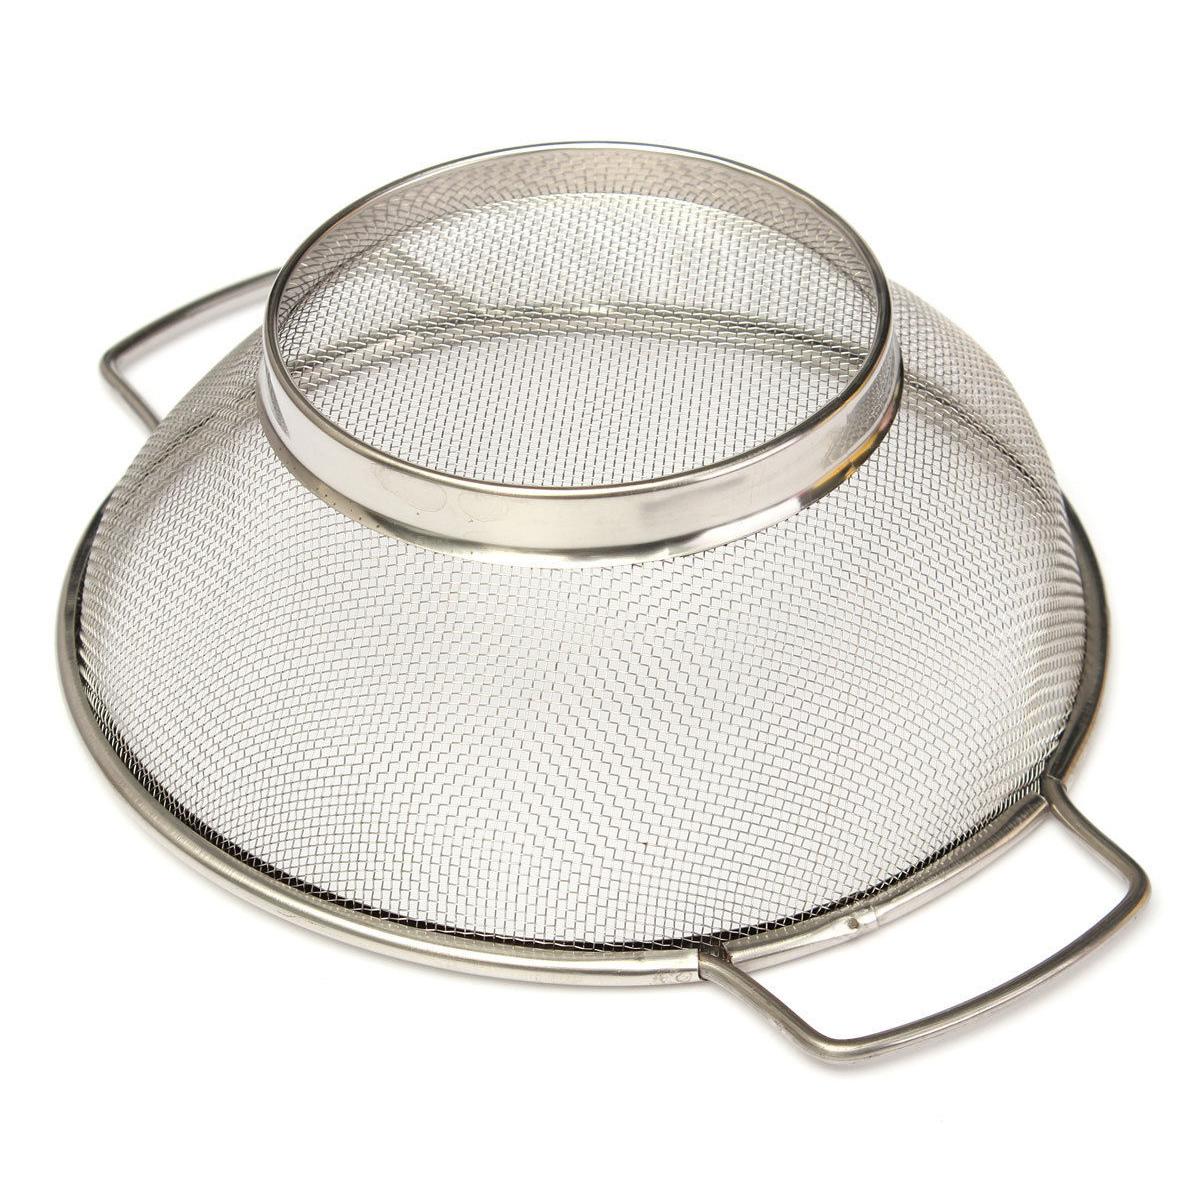 Stainless Steel Fine Mesh Strainer Bowl Drainer Sieve ...